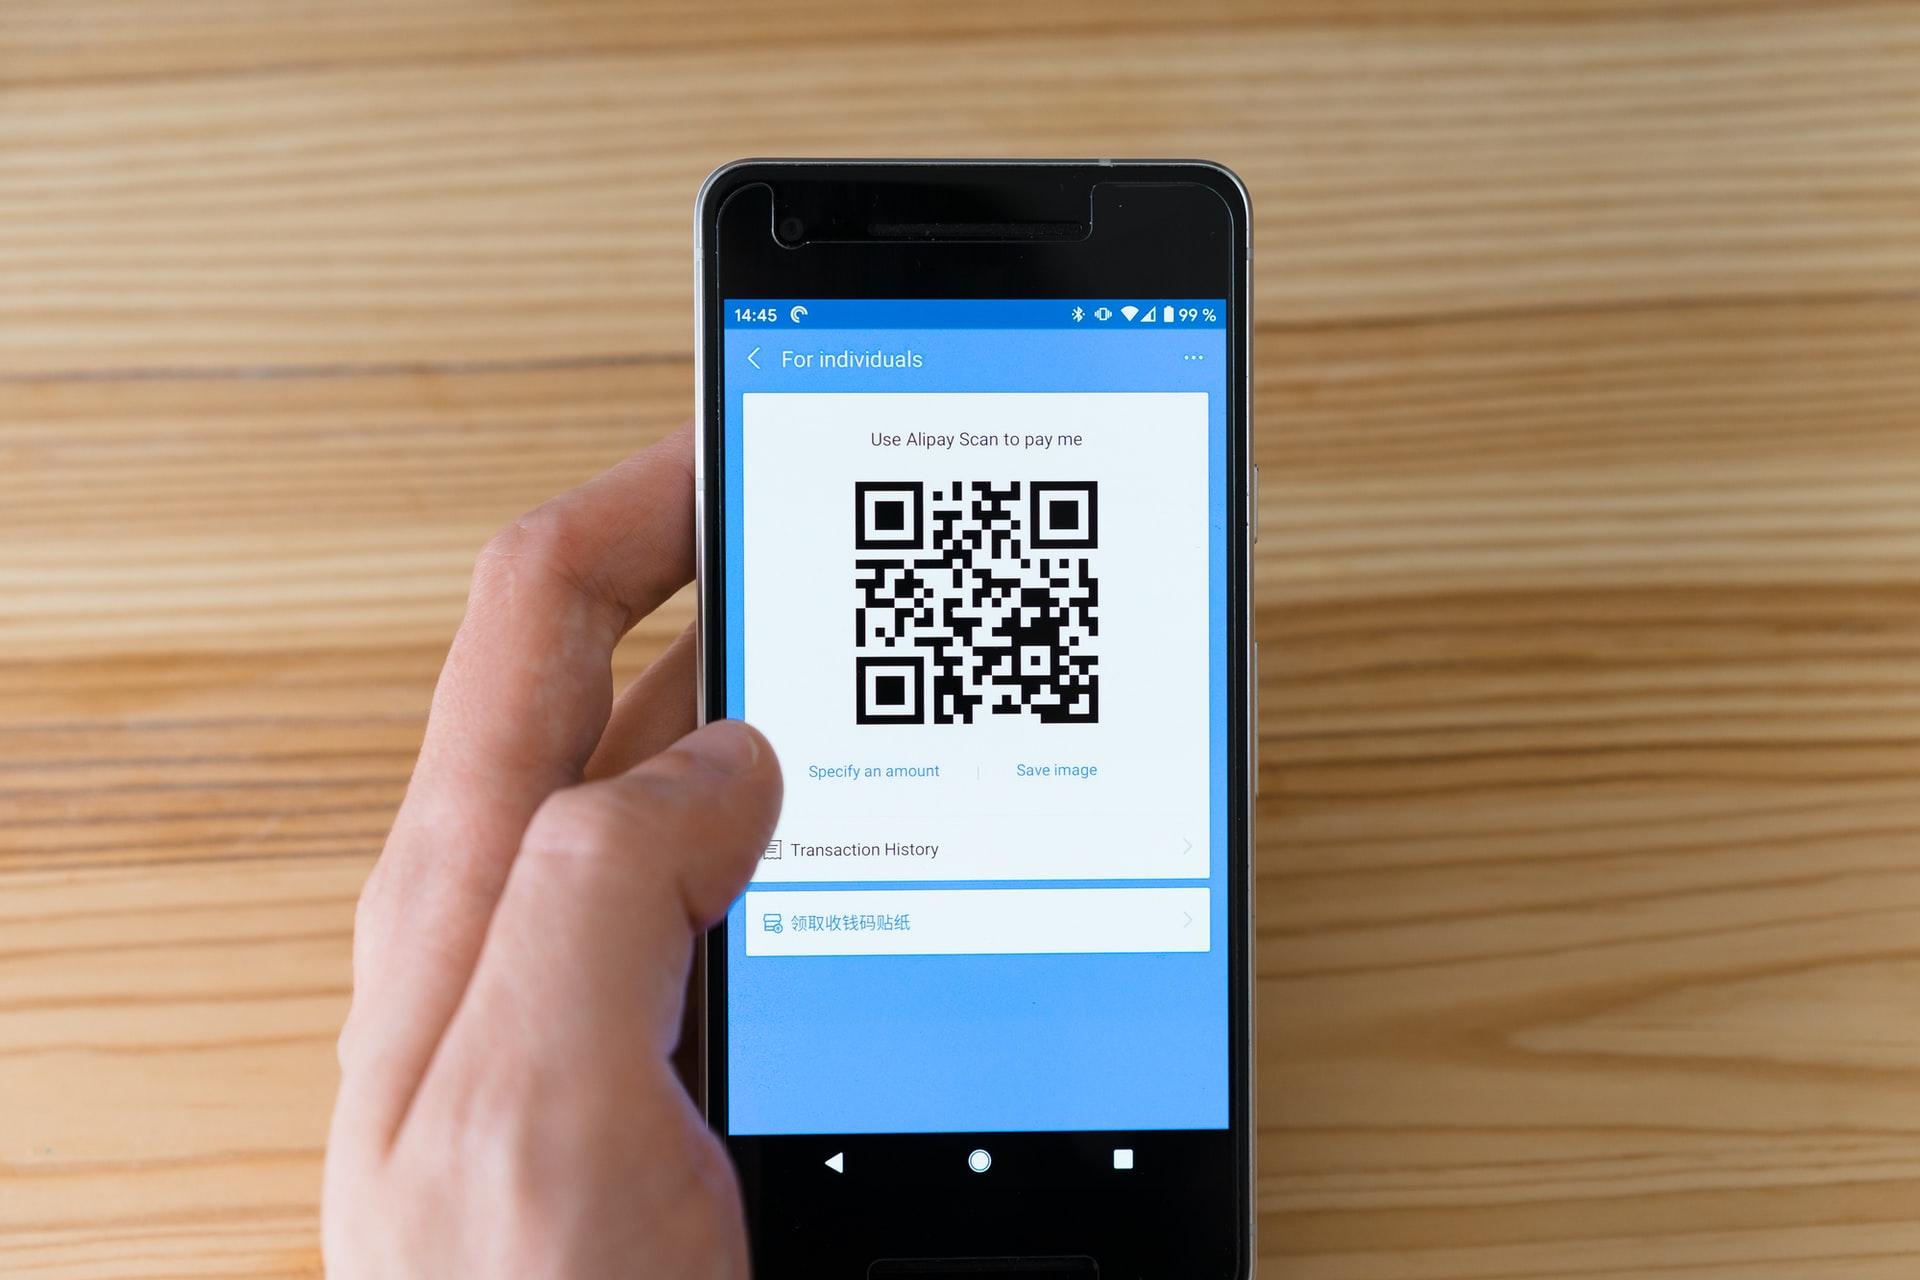 Ilustrasi pembayaran digital. Photo by Markus Winkler on Unsplash